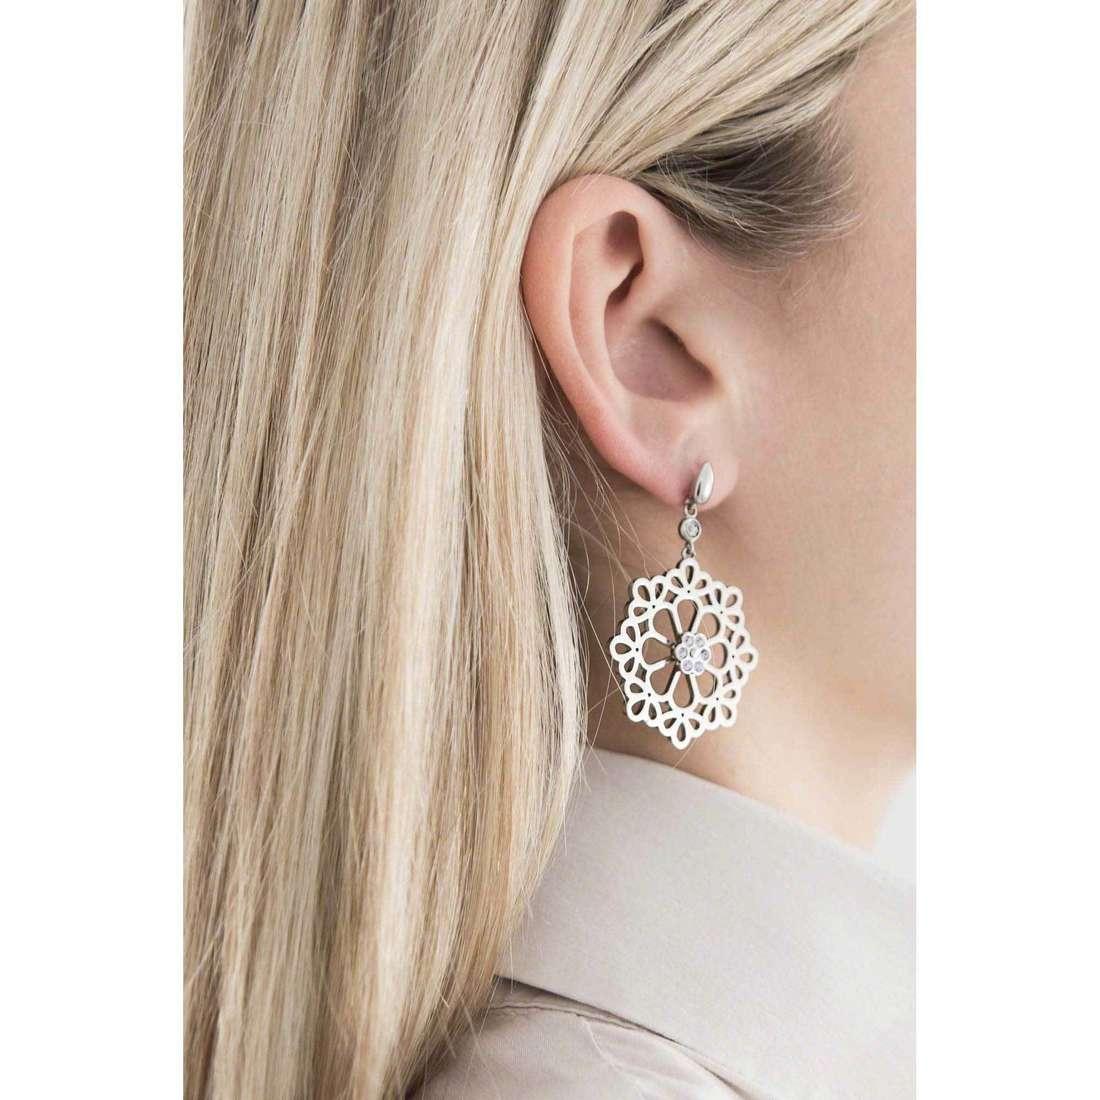 Morellato boucles d'oreille Kaleido femme SADY08 indosso